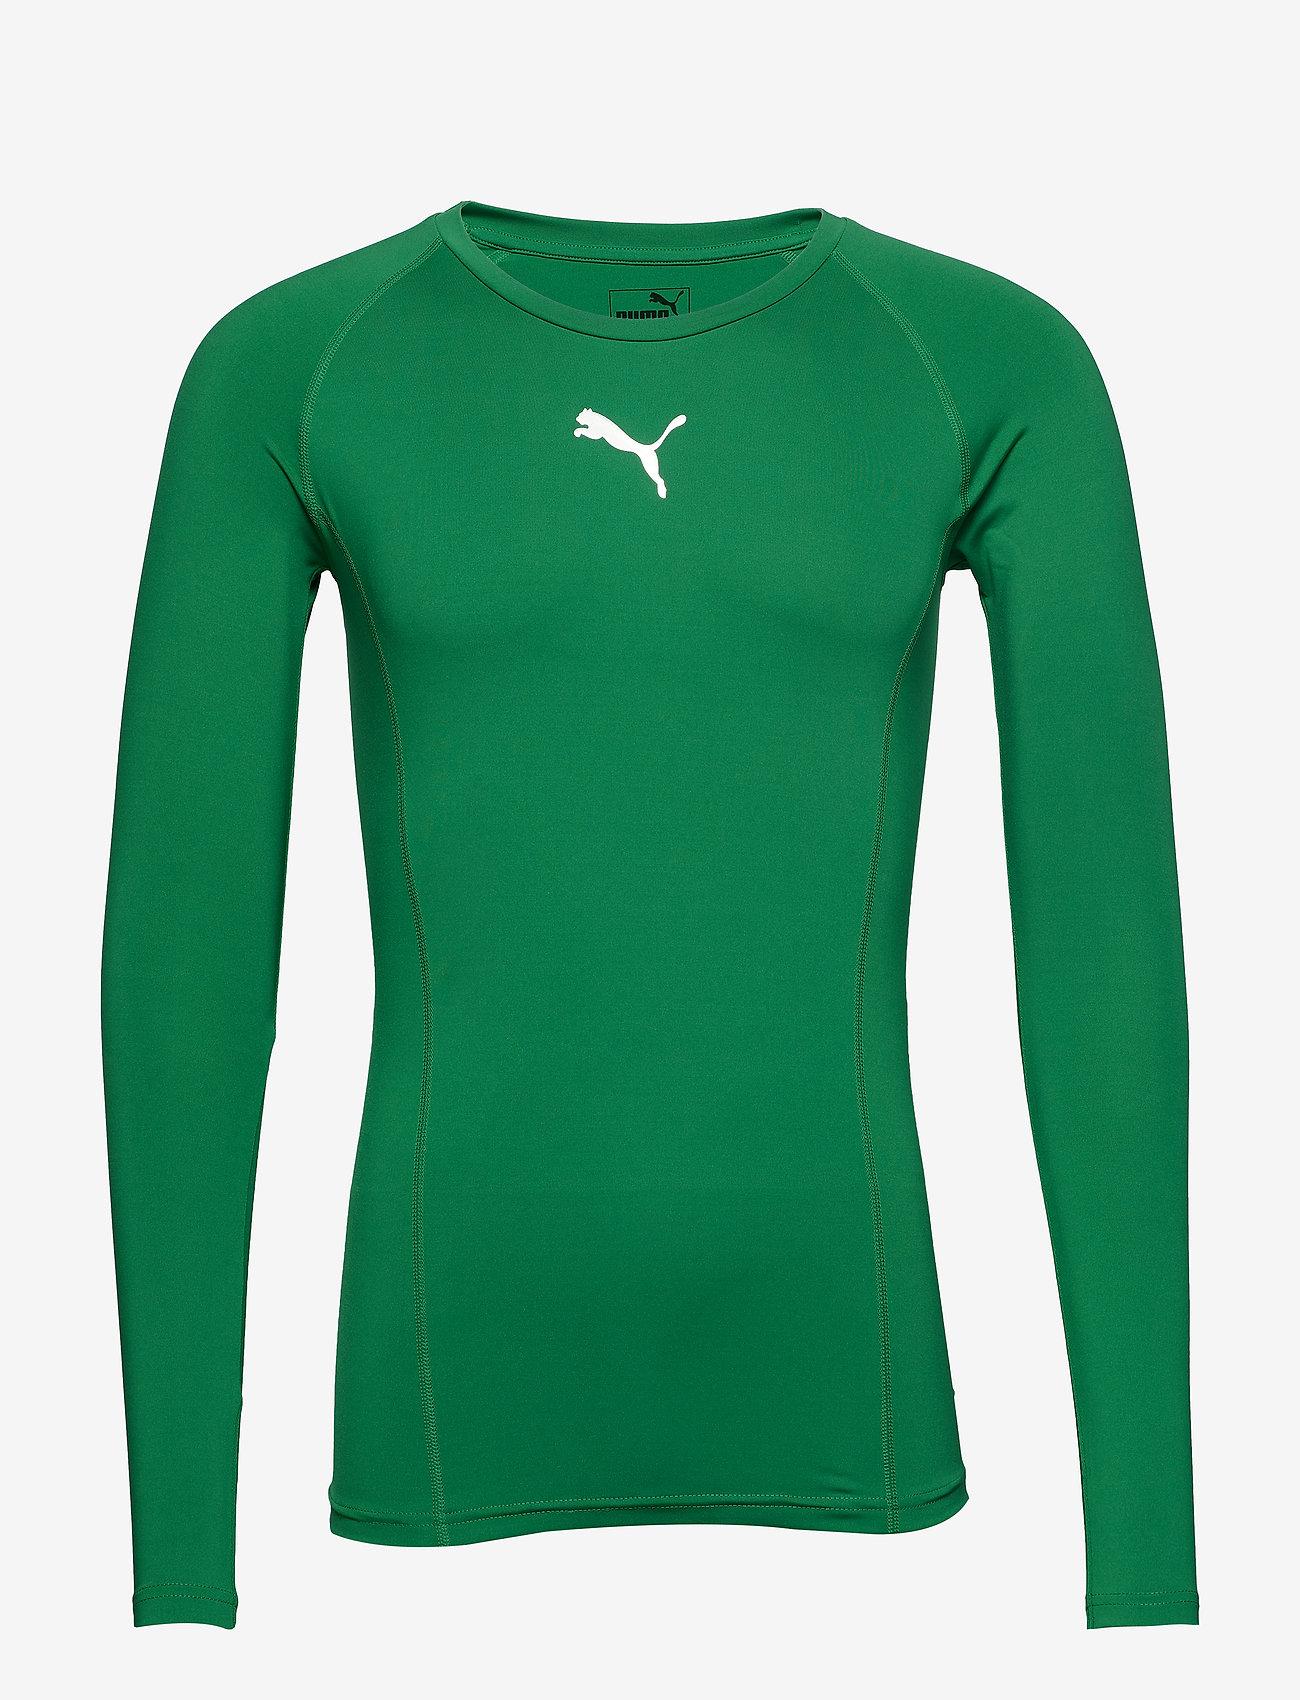 PUMA - LIGA Baselayer Tee LS - football shirts - pepper green - 0